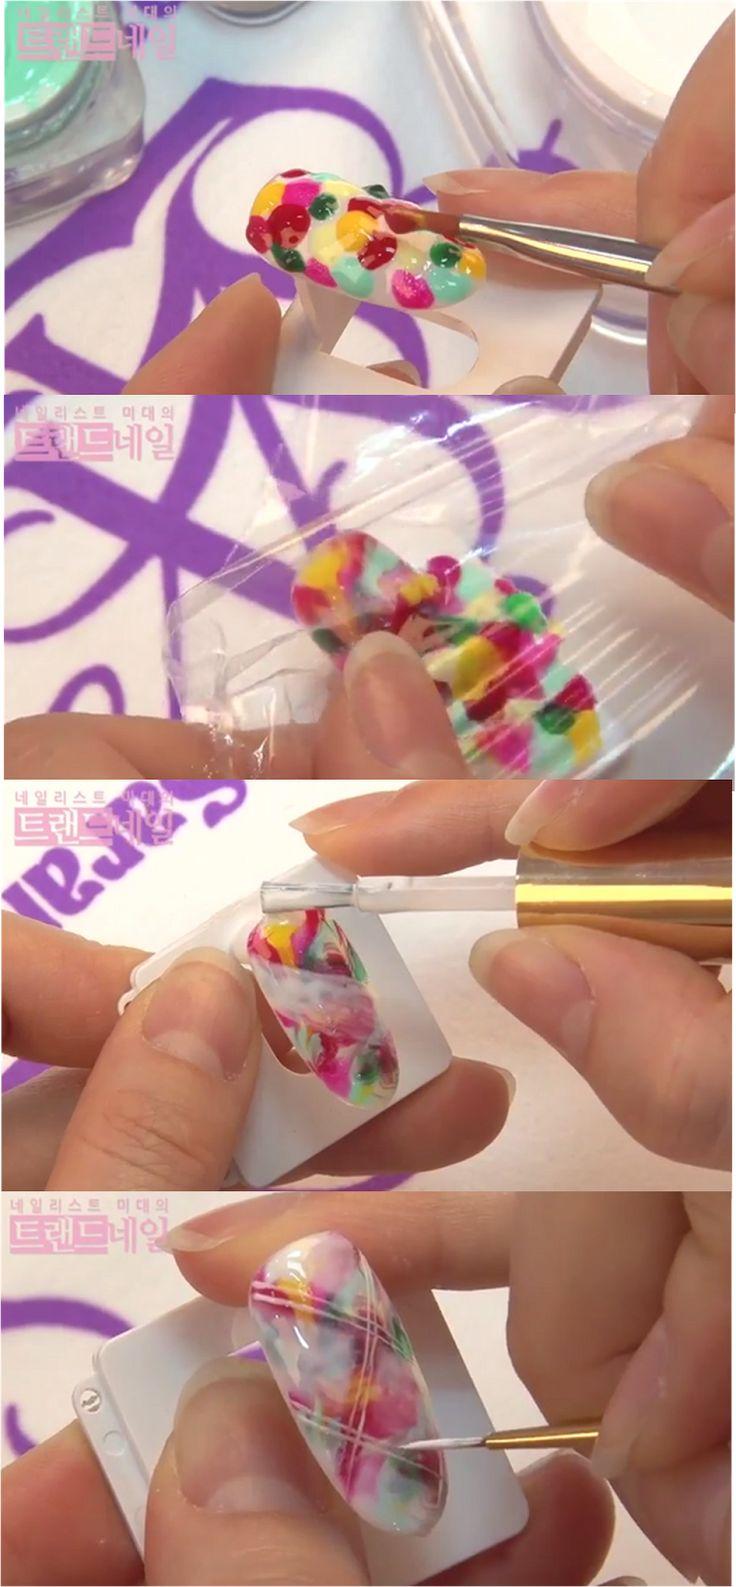 Sara Youtube Nail Art Class, Marbling Nail Art, White Plaid Check line Nail Art